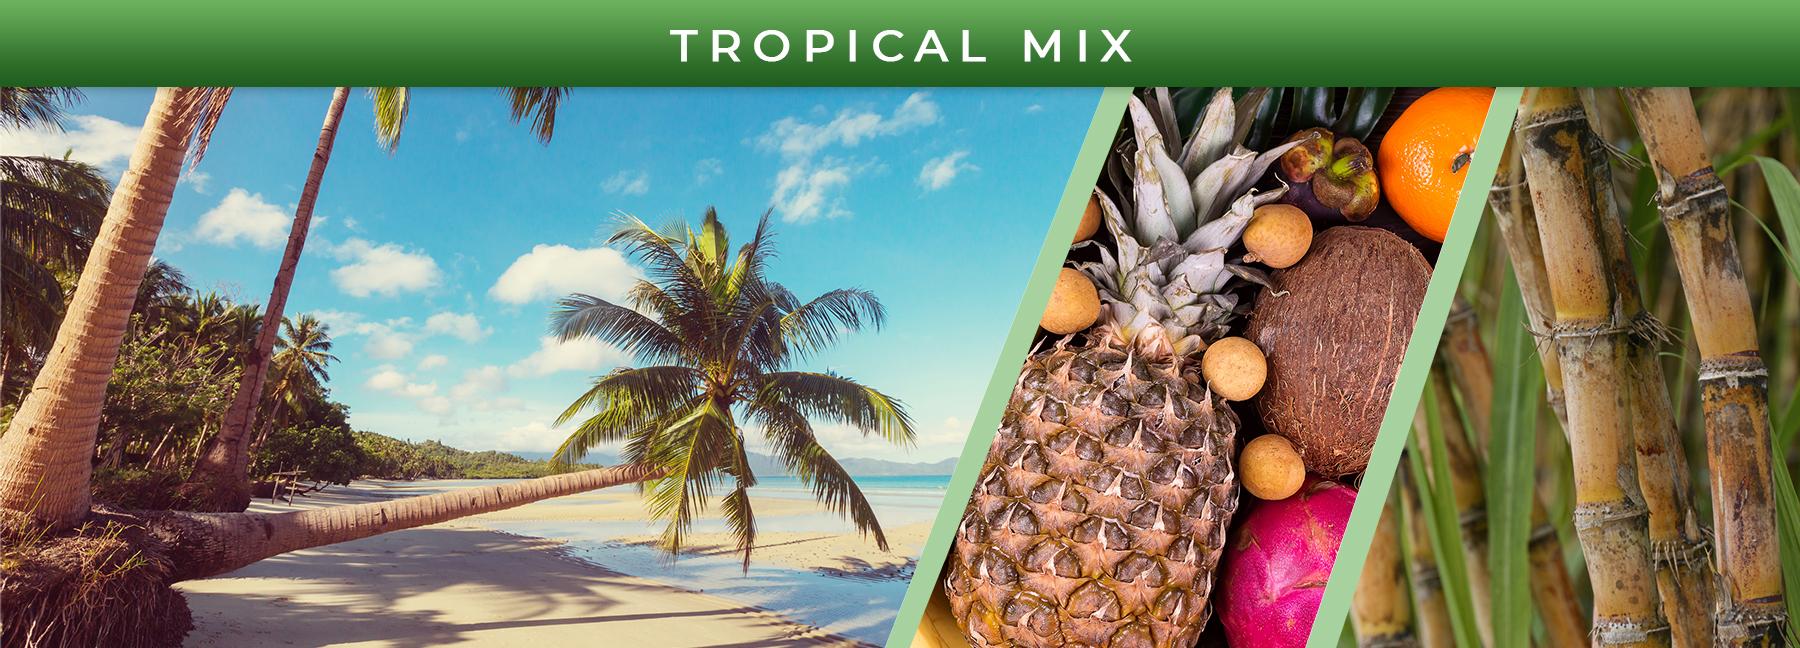 Tropical Mix fragrance elements